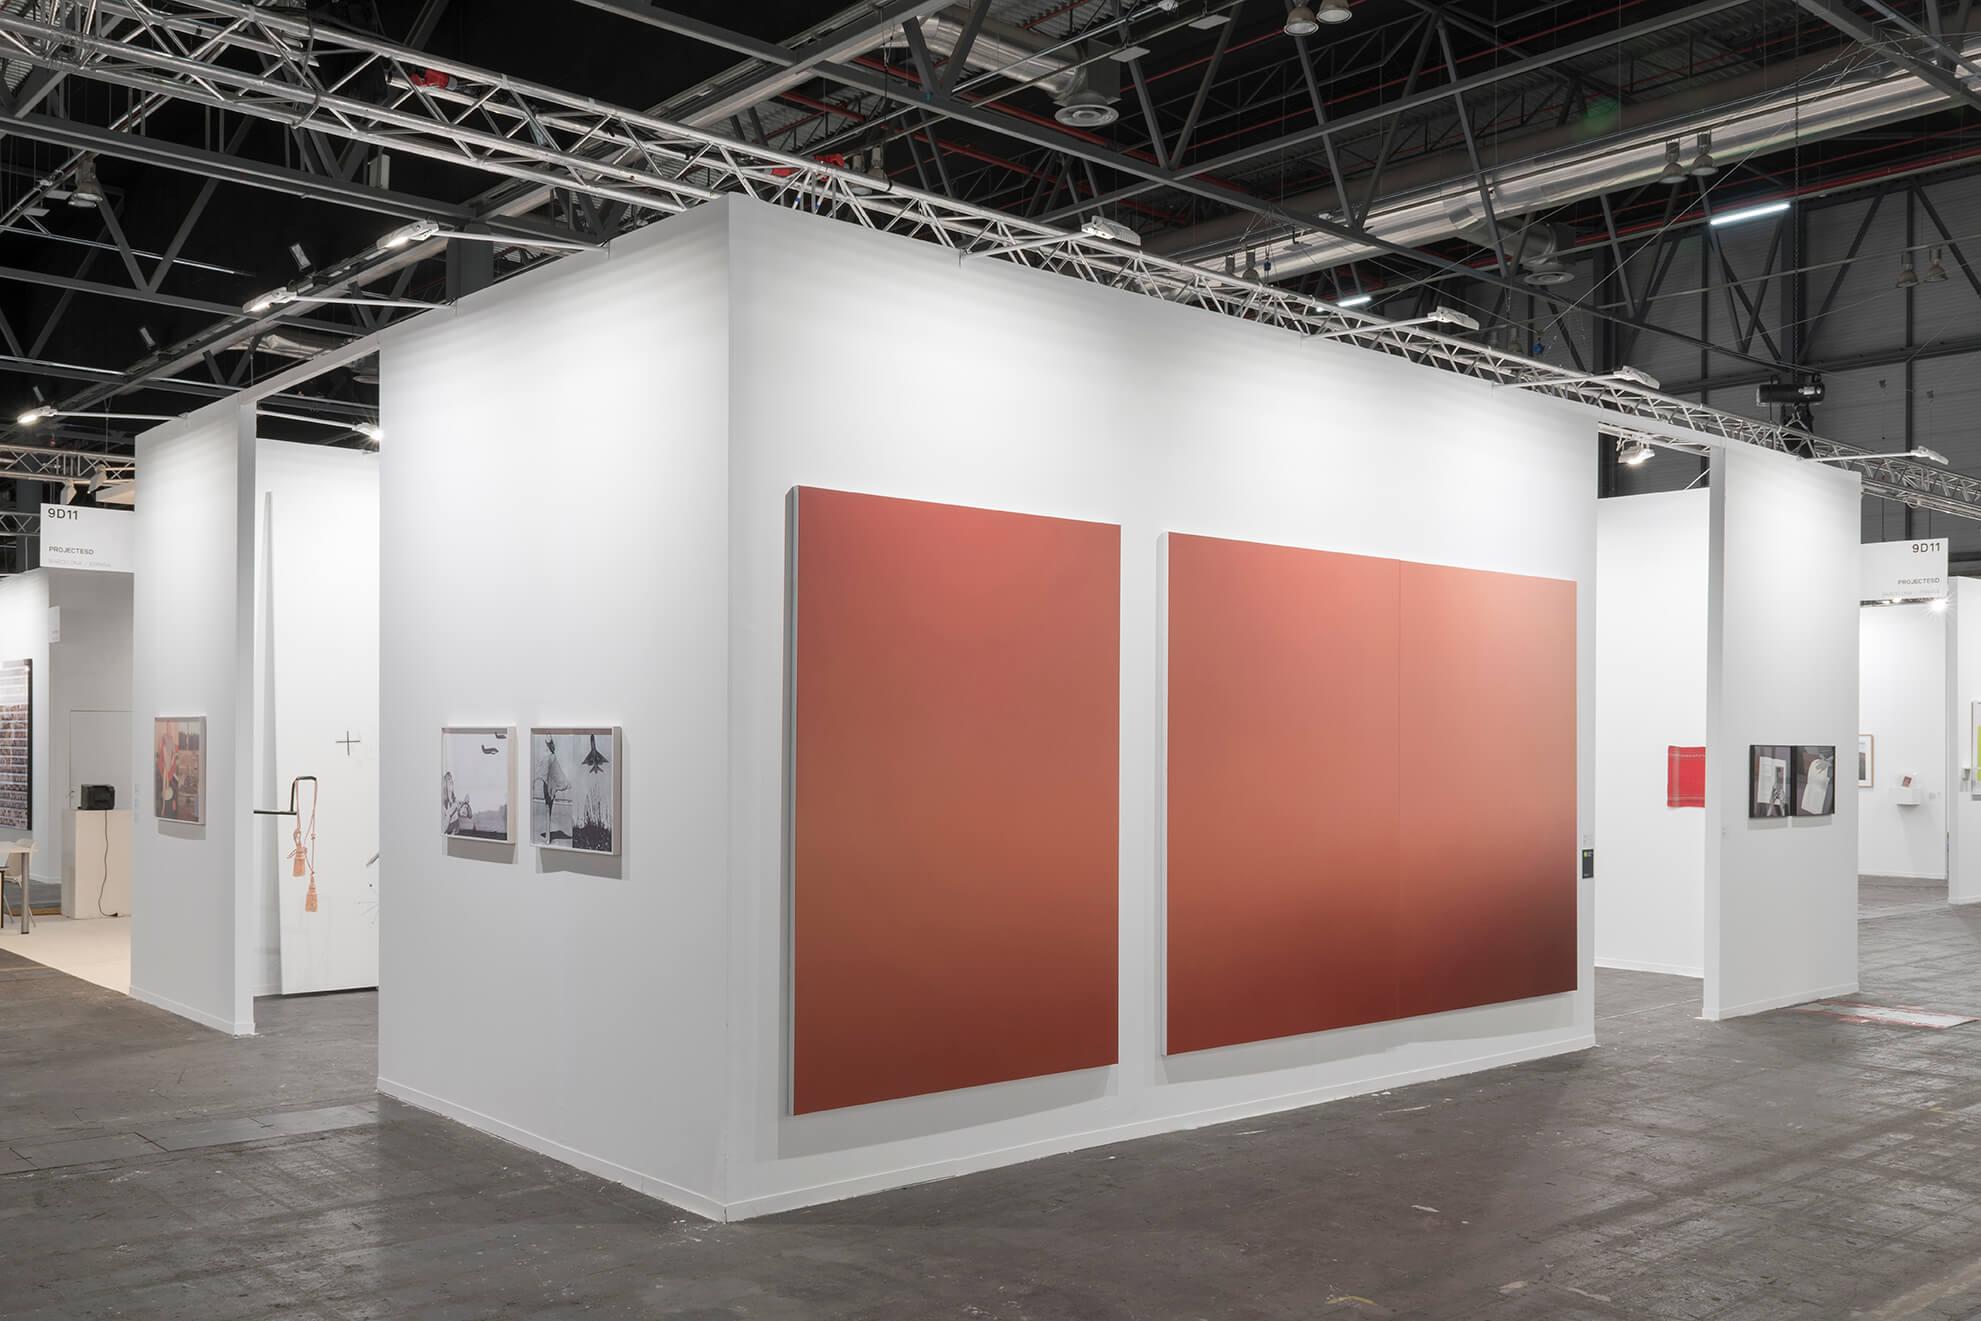 ProjecteSD, Booth 9D11 | ARCO 2019 | ProjecteSD